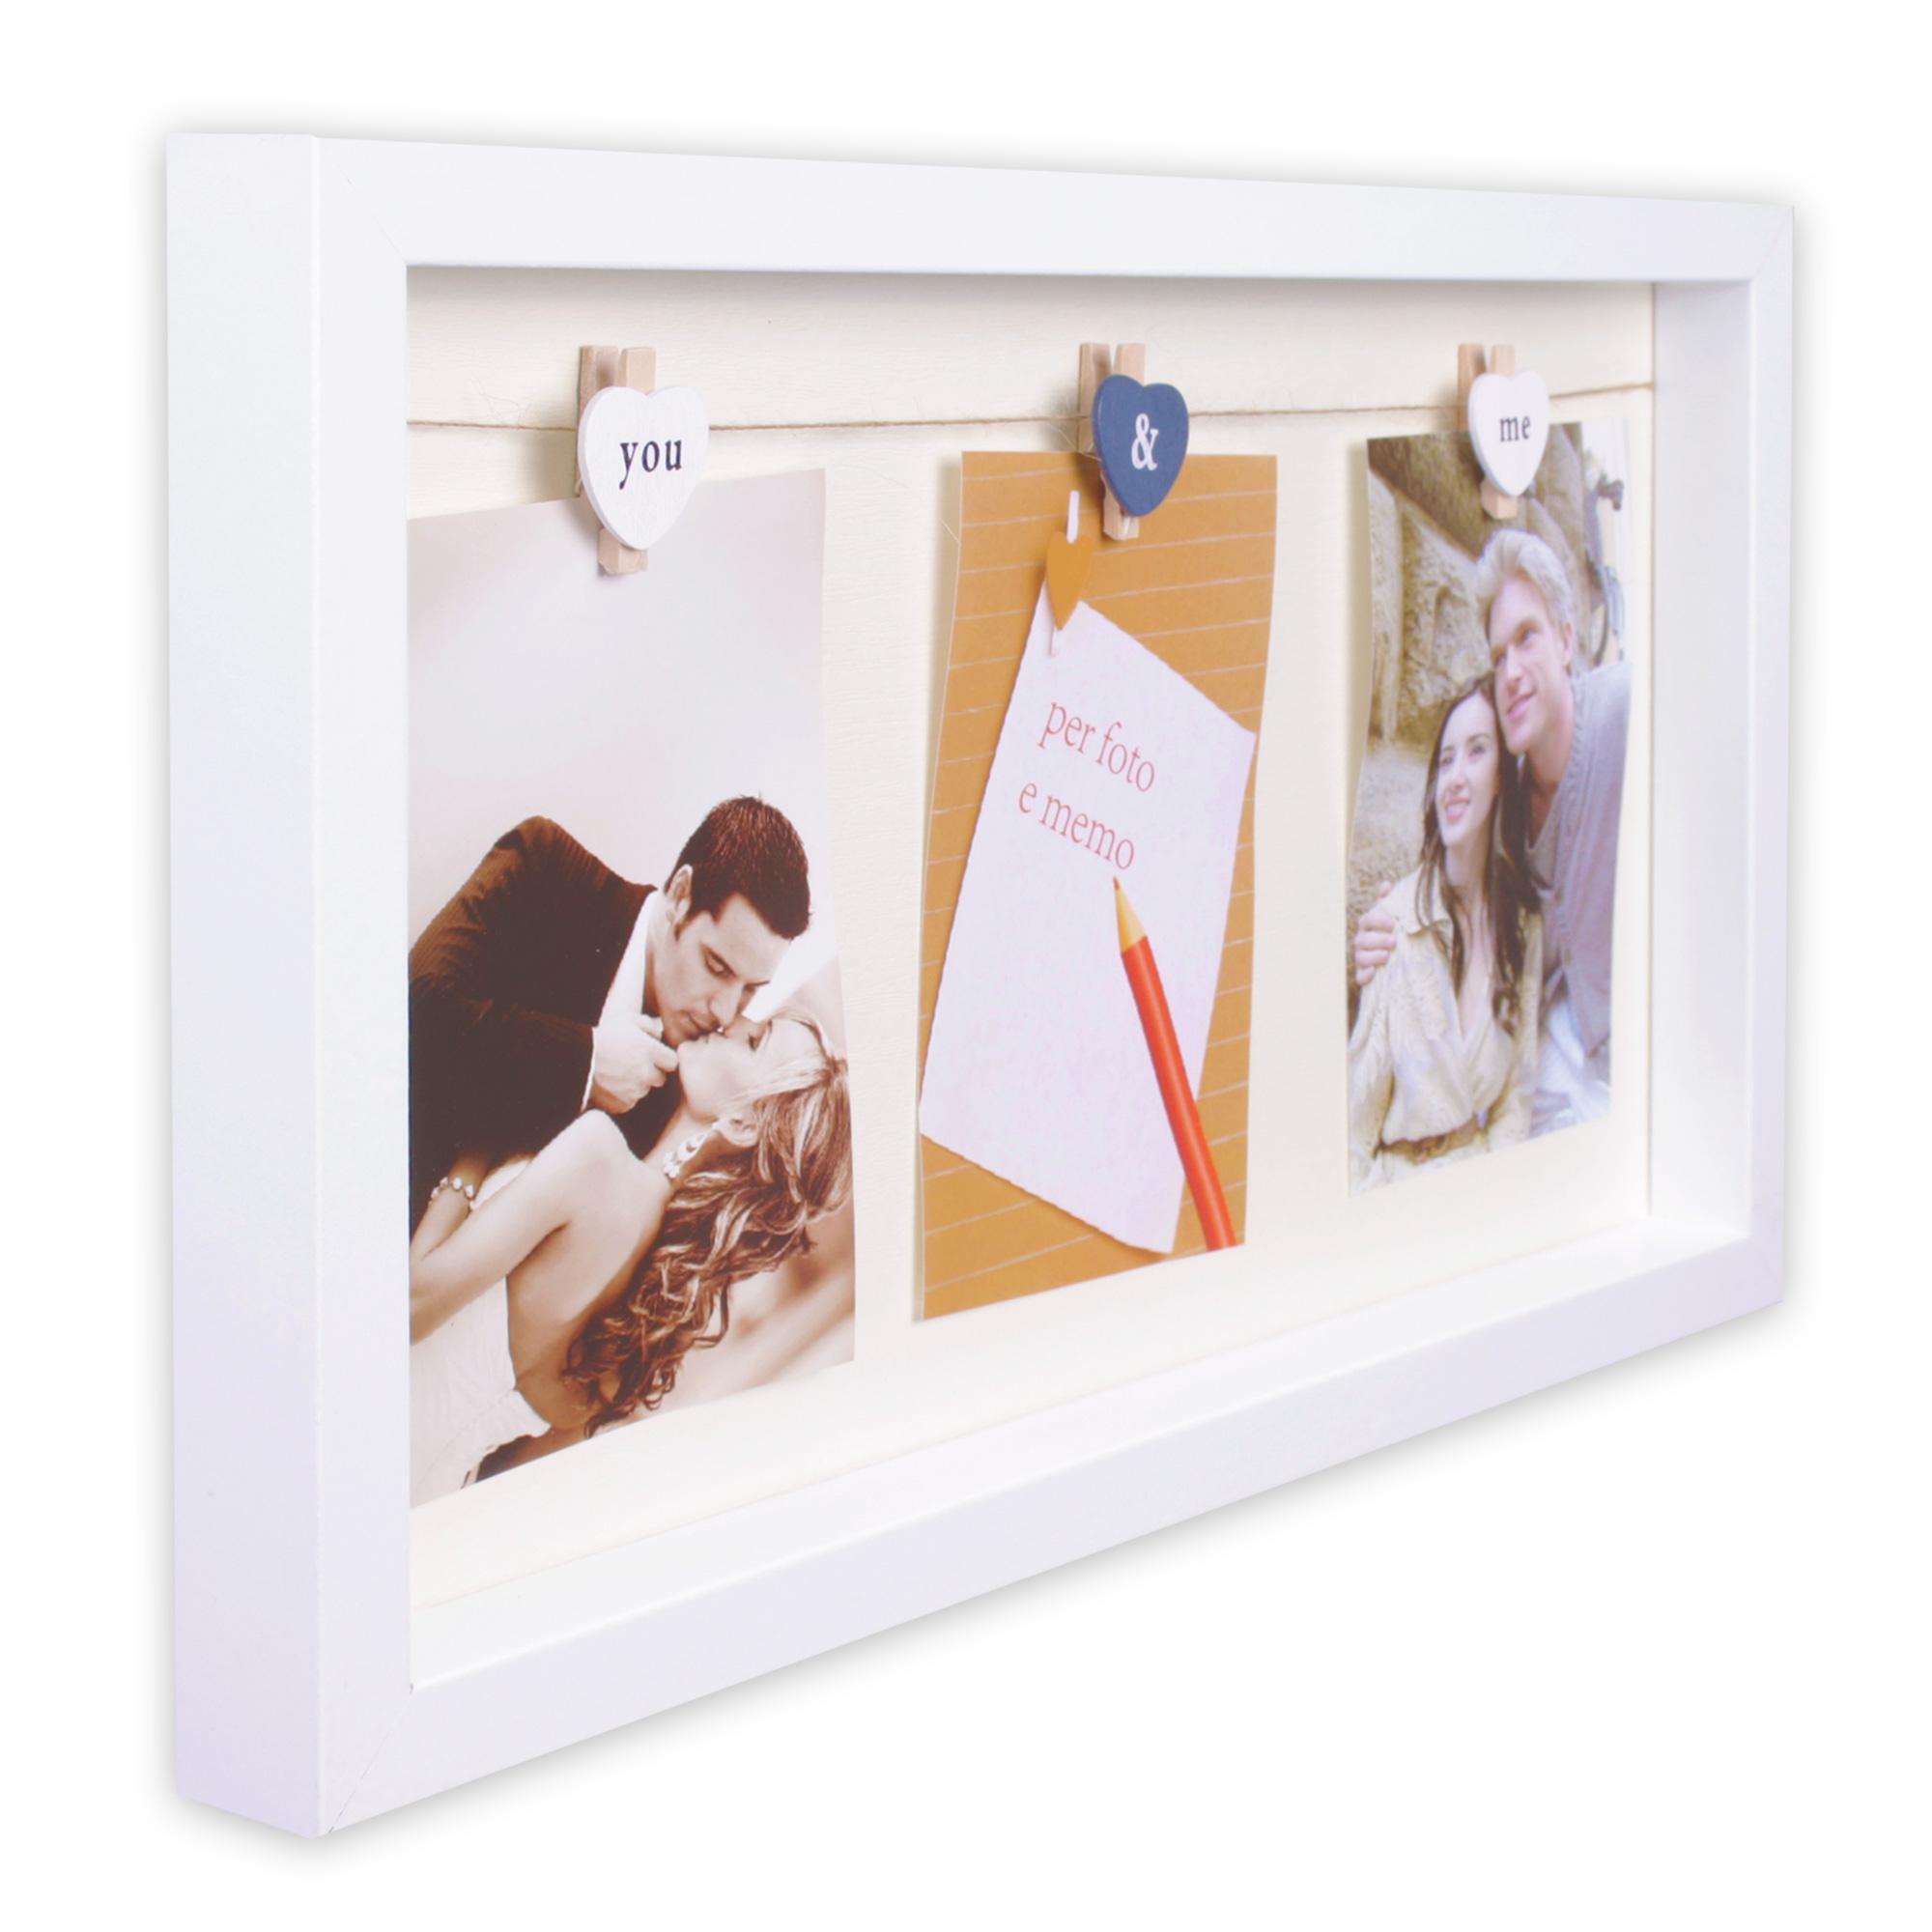 bilderrahmen aus mdf 24 x 43 x 3 cm f r 3 fotos 10 x 15 cm modell you me ebay. Black Bedroom Furniture Sets. Home Design Ideas